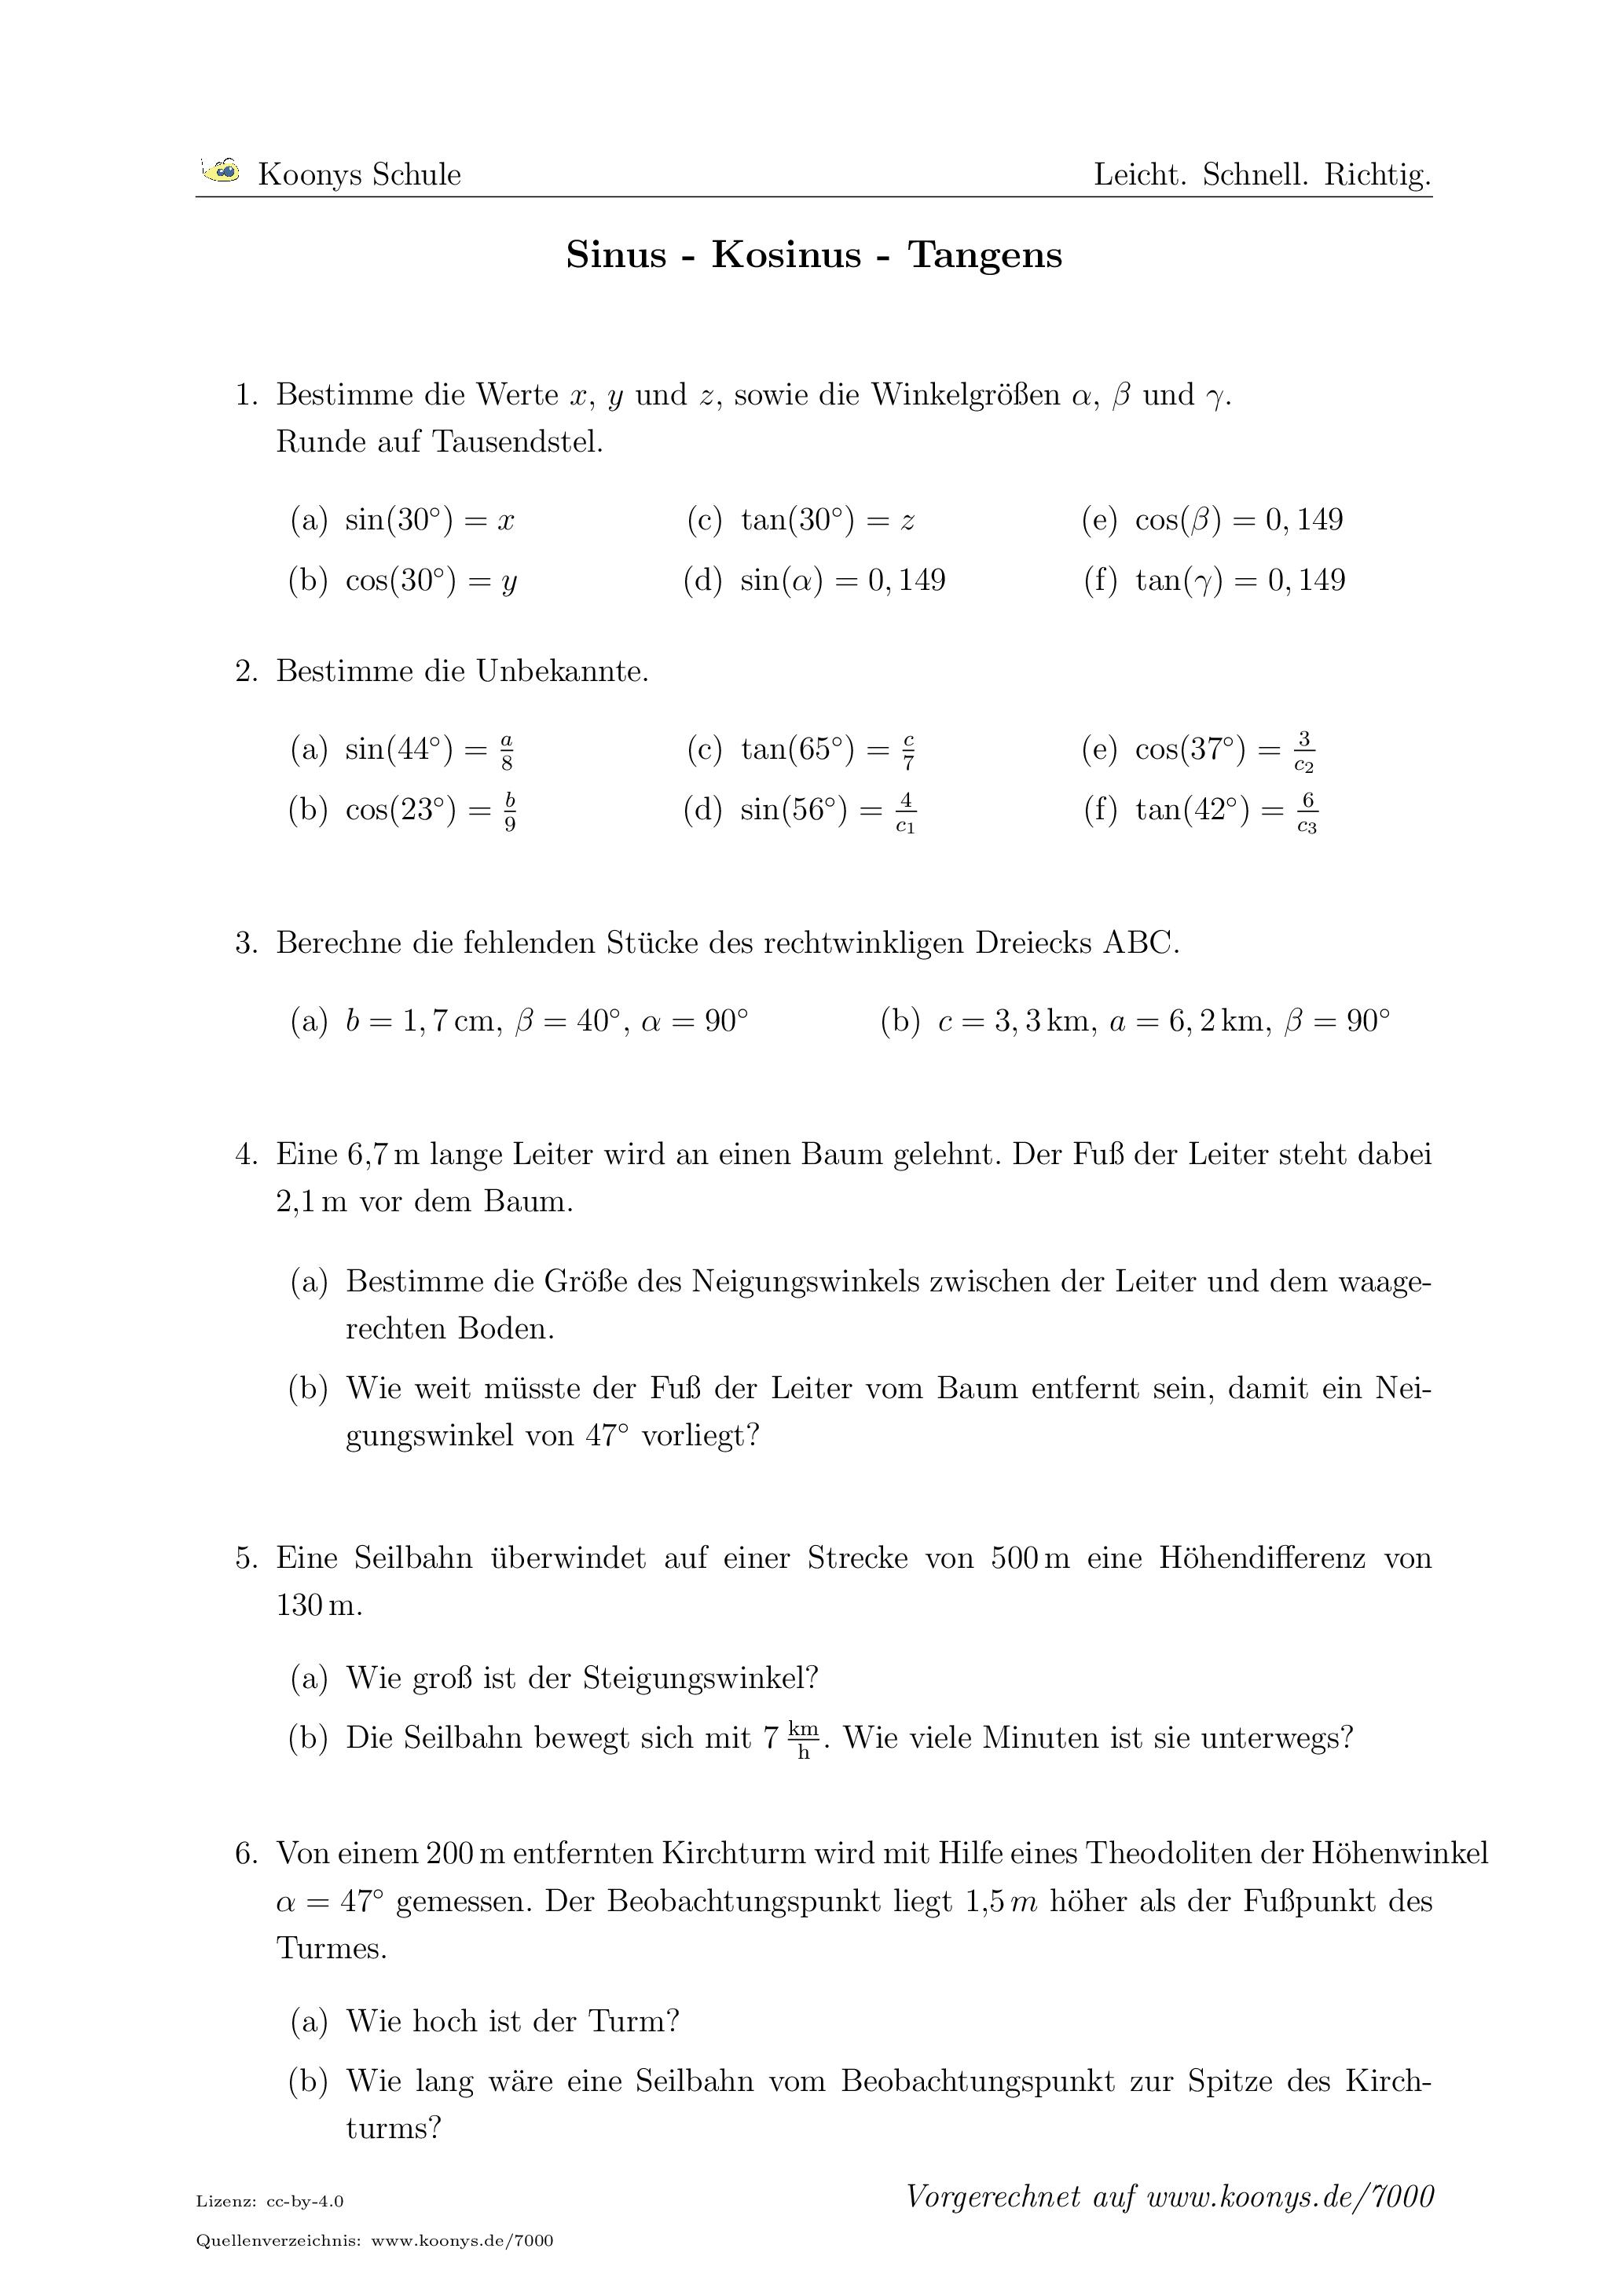 Aufgaben Sinus - Kosinus - Tangens mit Lösungen | Koonys Schule #7000